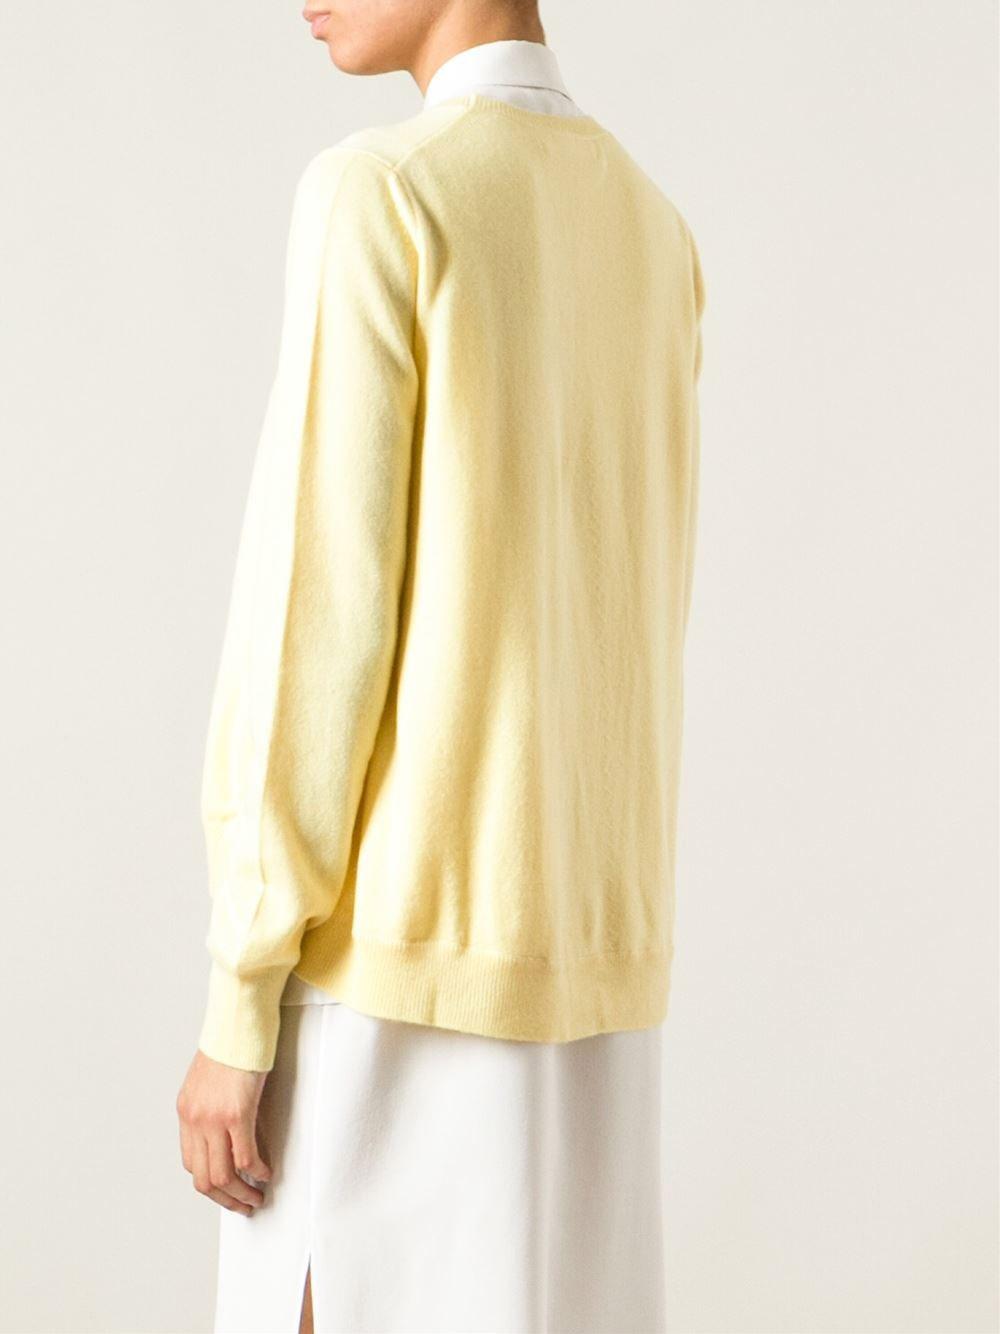 Louise Paris - MARNI Pale yellow cashmere crew neck sweater Retail ...